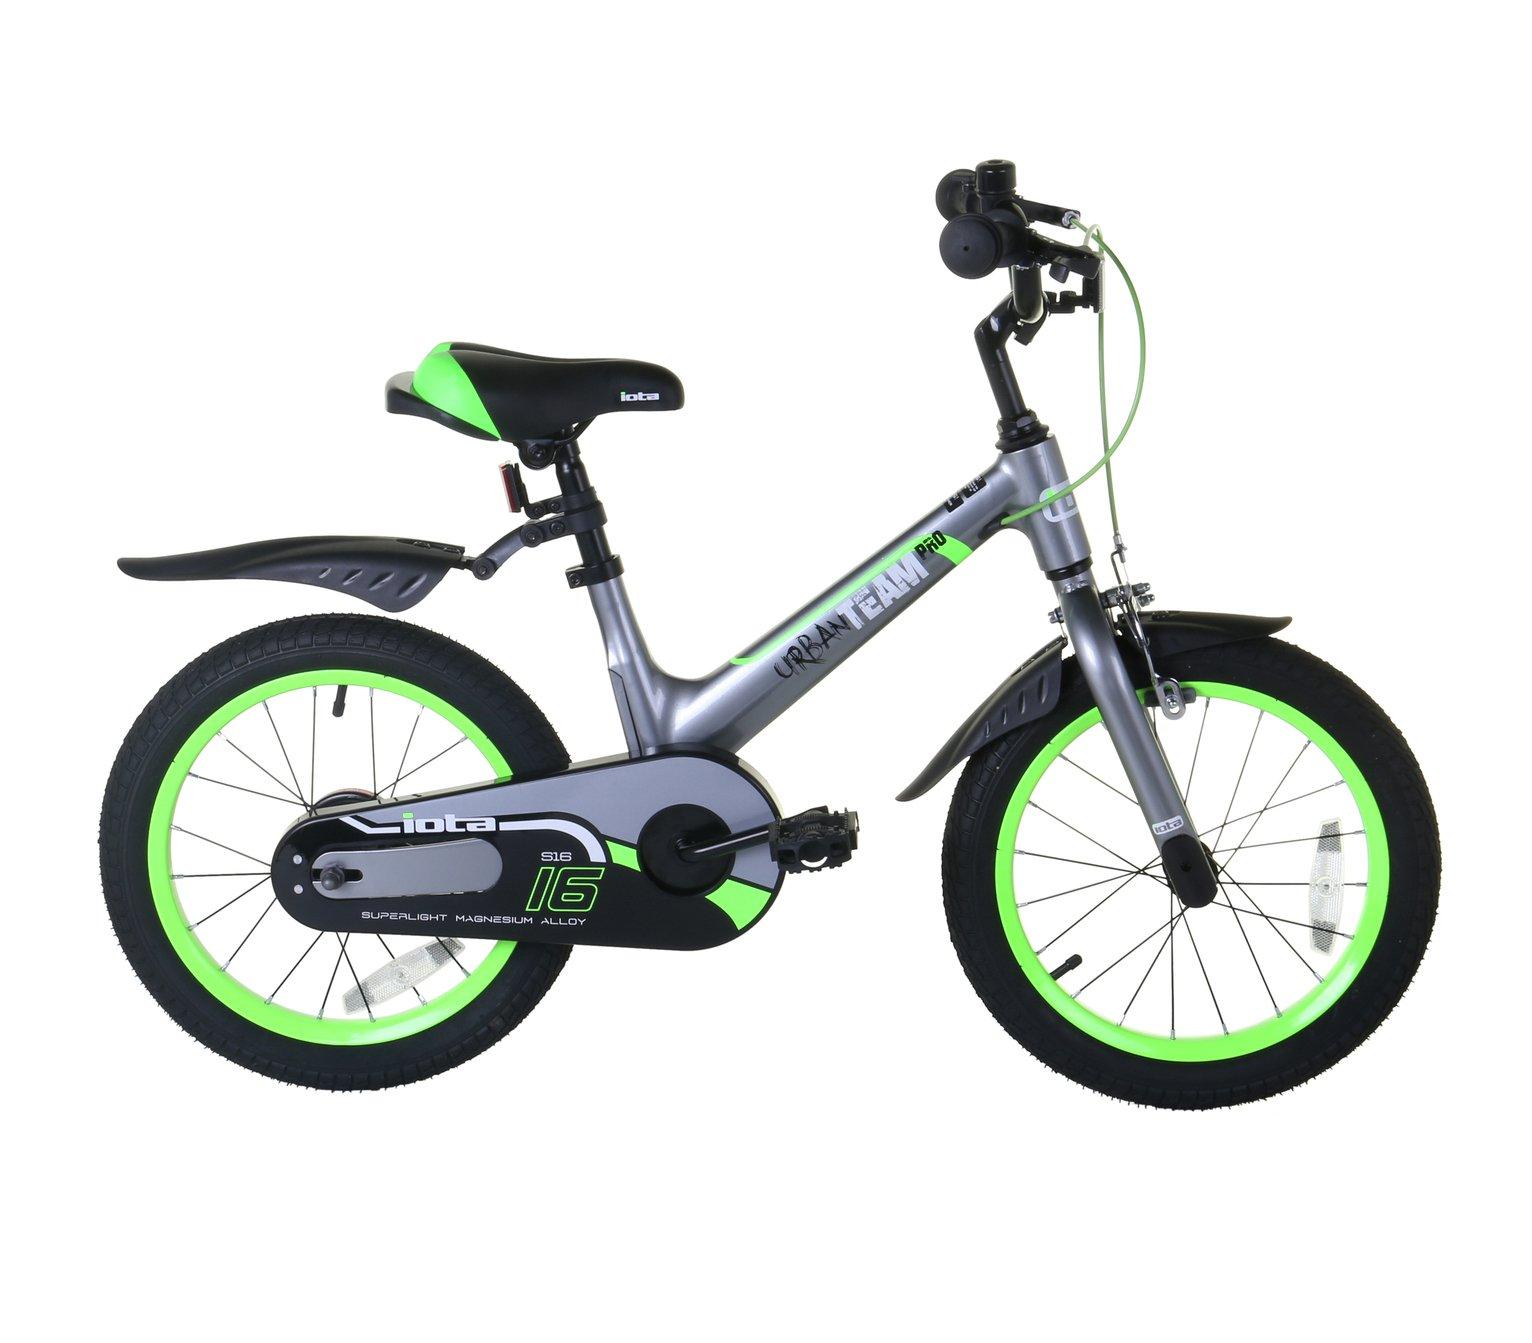 Pink Iota City Star 12 inch Wheel 9 Inch Frame Size Alloy Kid/'s Bike